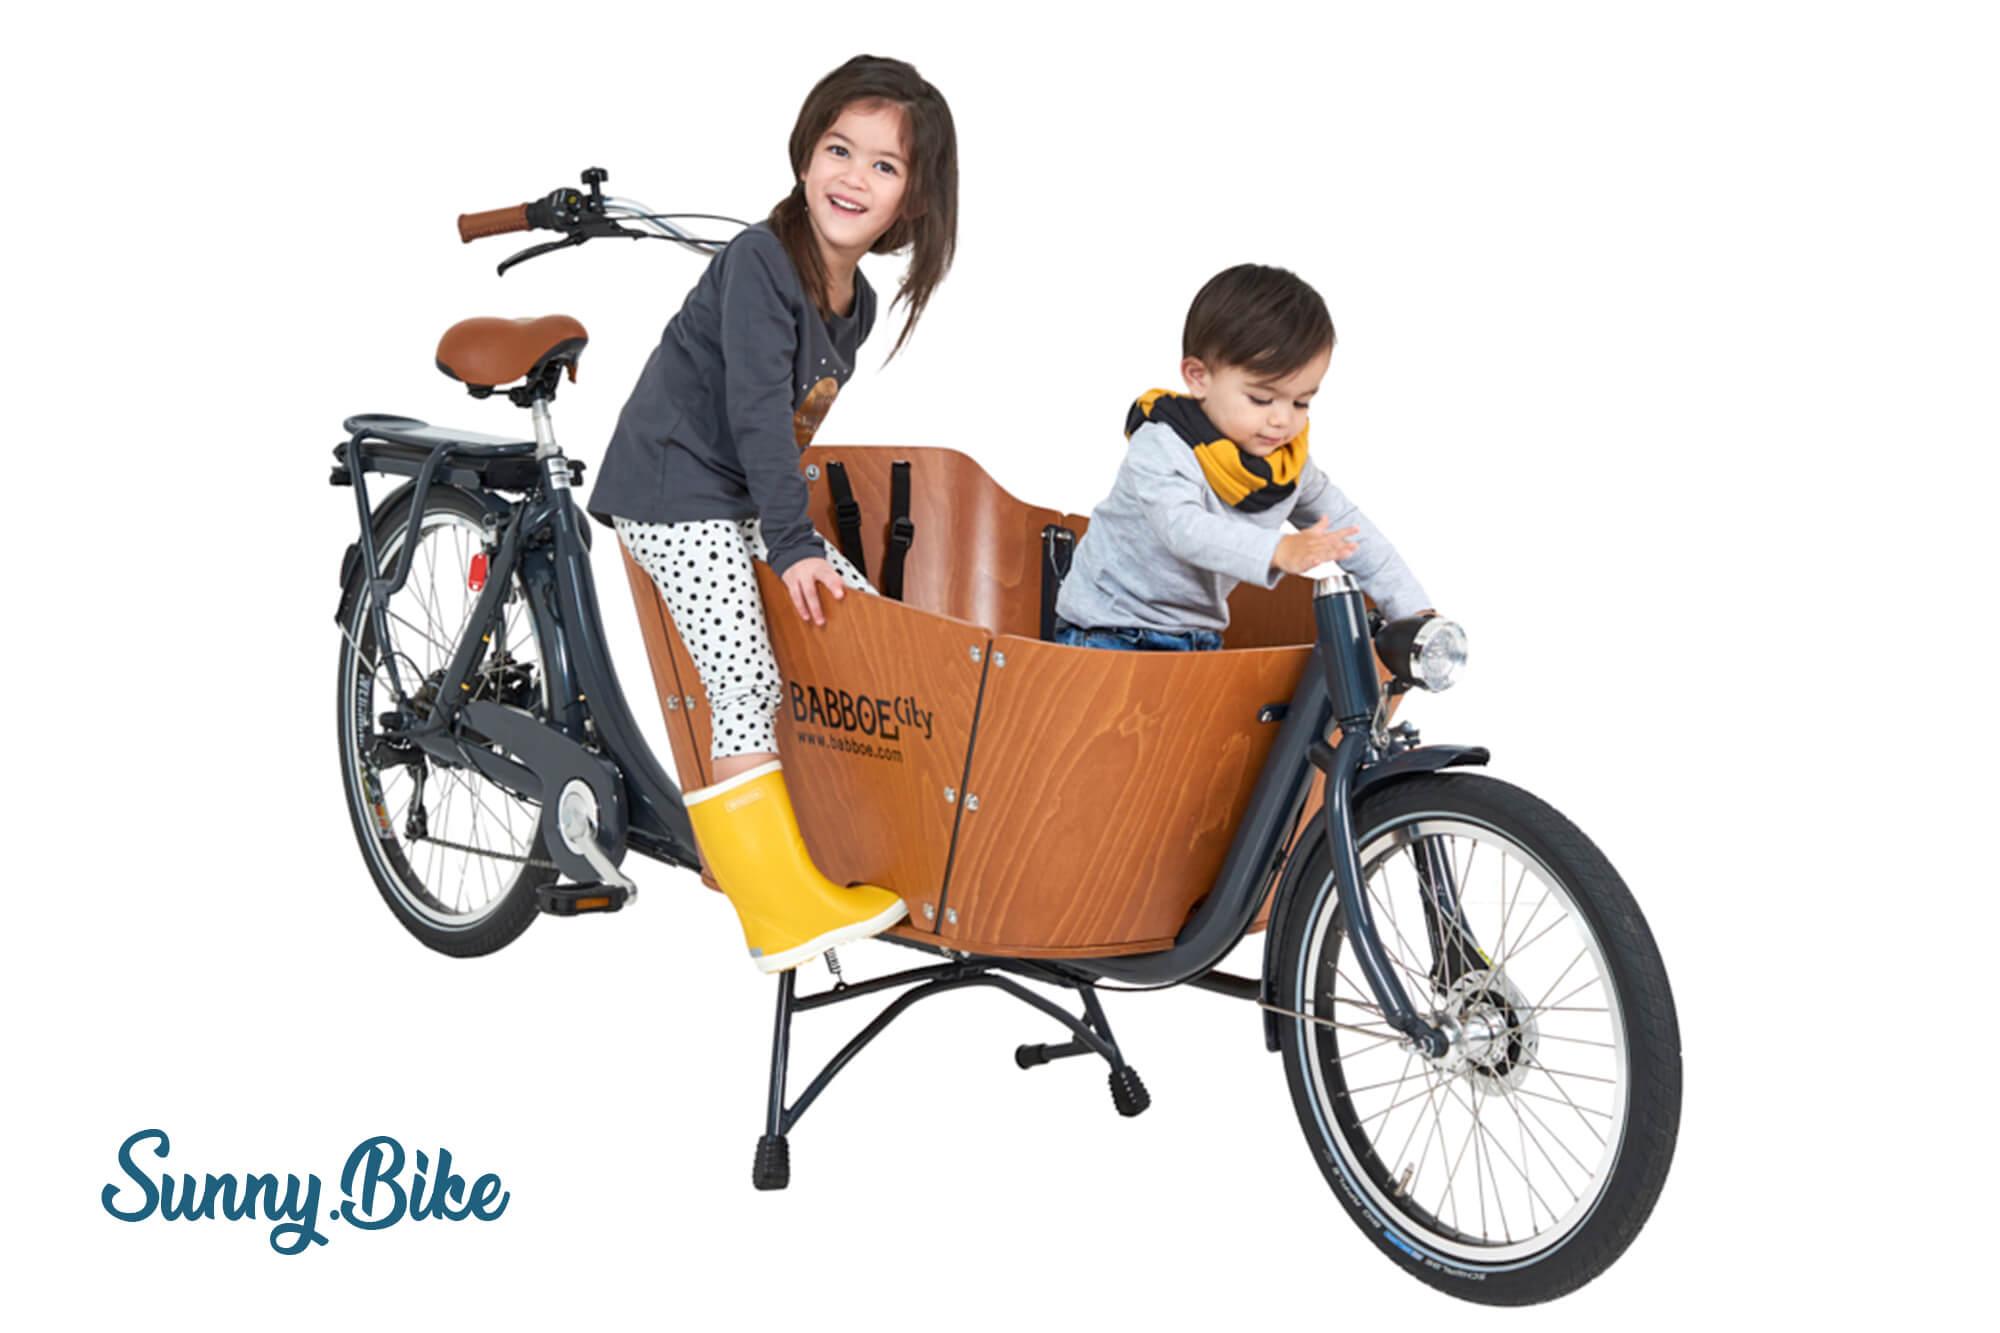 Baboe Lastenrad bei Sunny Bike im Verleih auf Fehmarn